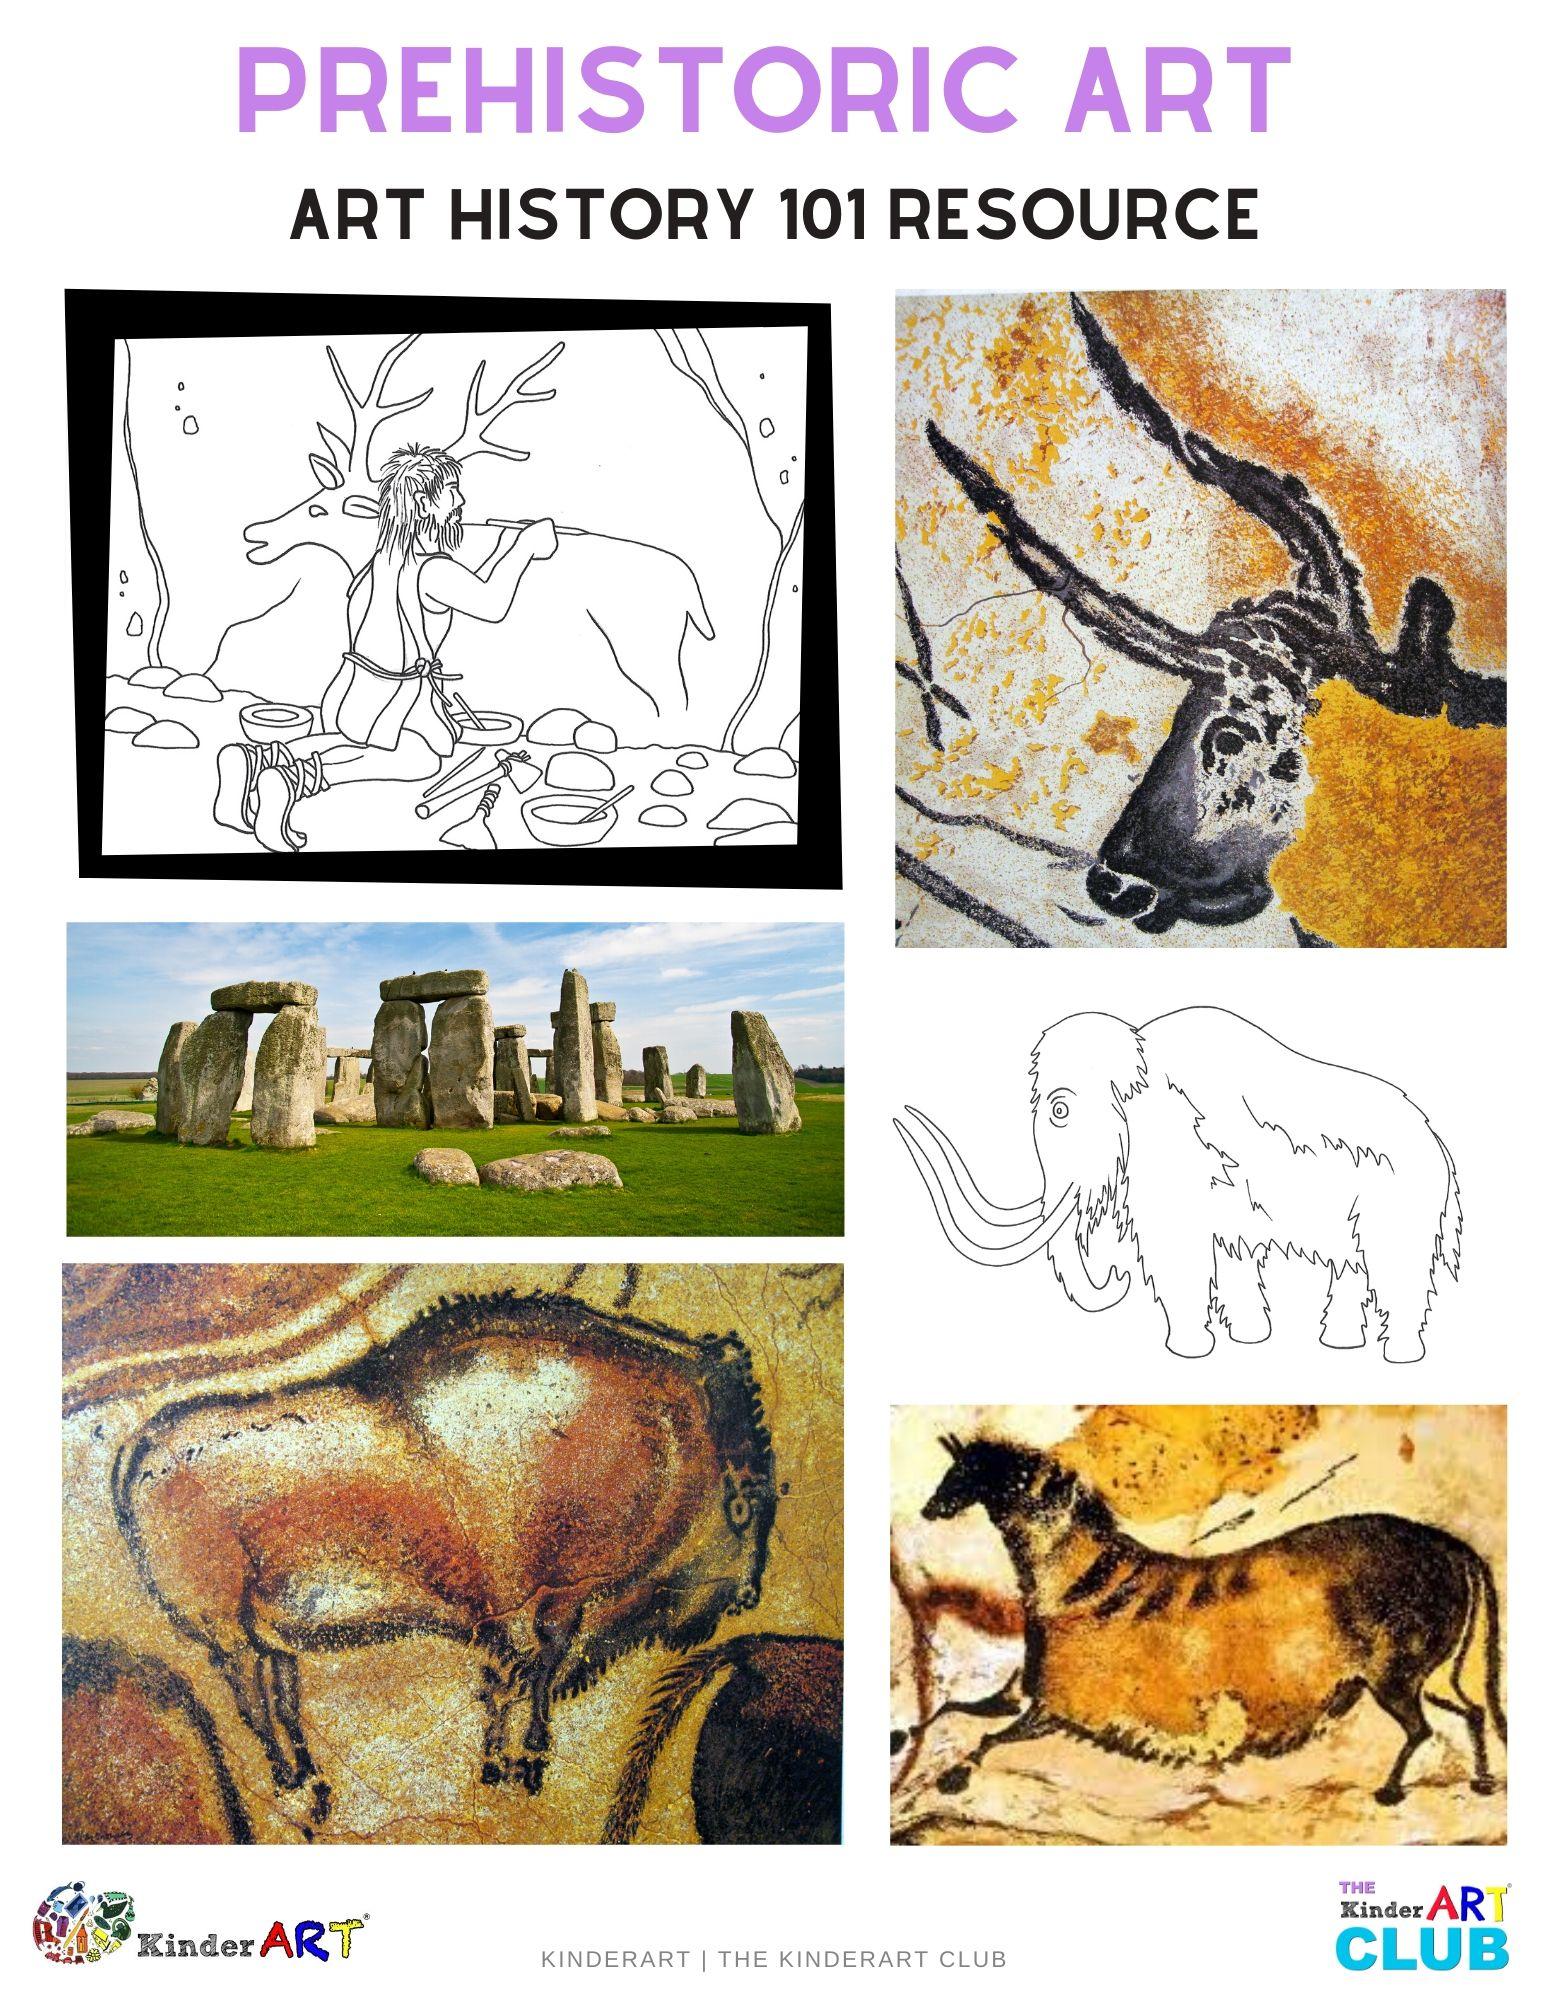 arthistory101_prehistoric